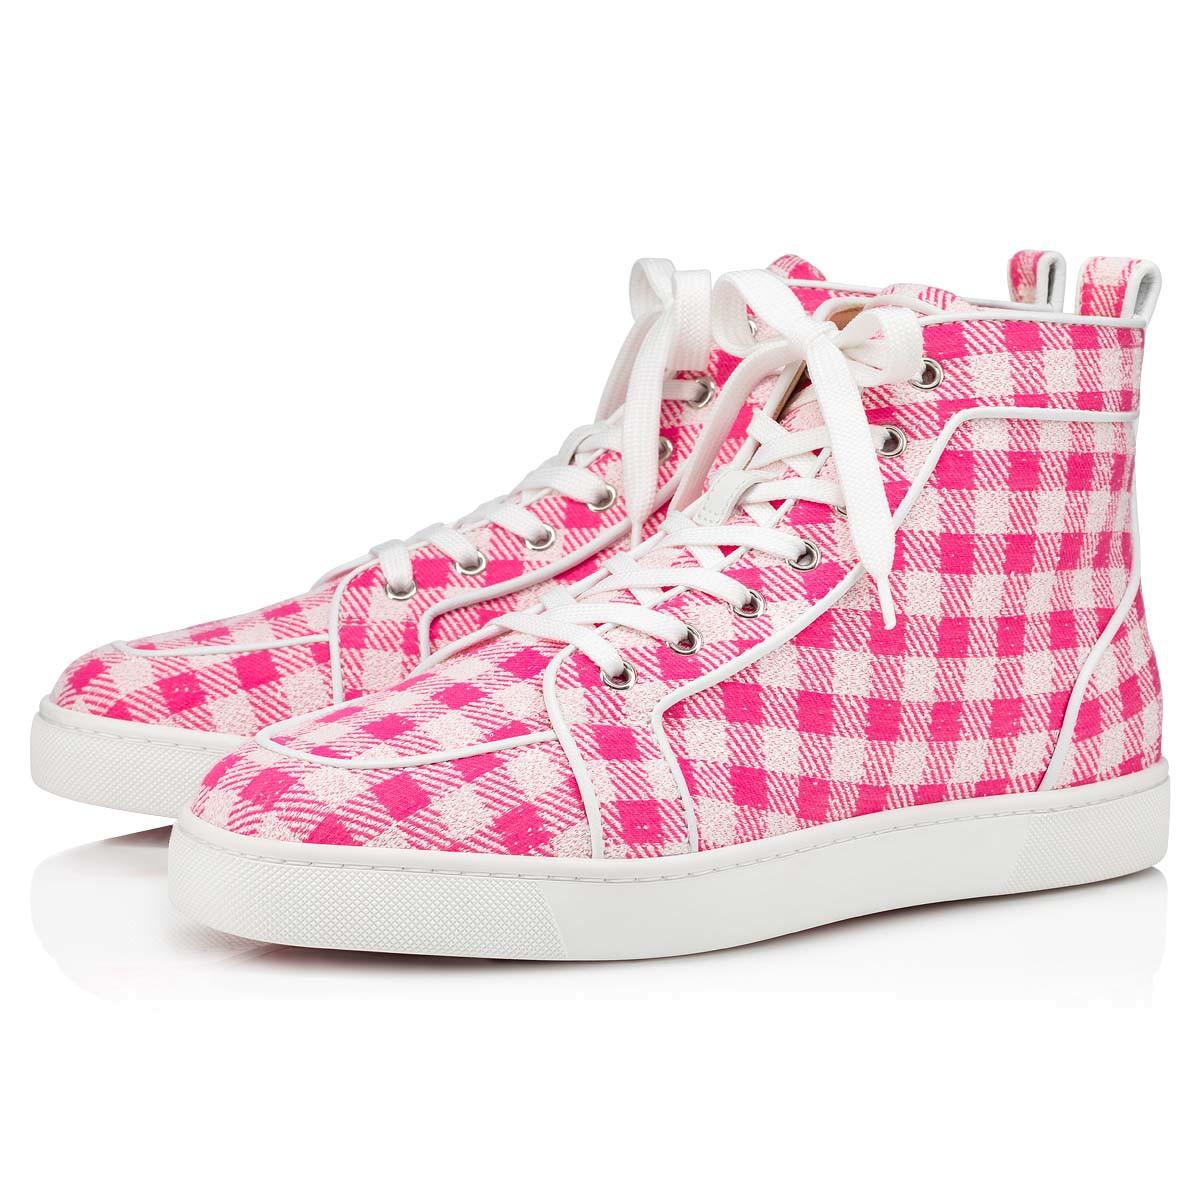 Shoes - Rantus Orlato Flat - Christian Louboutin